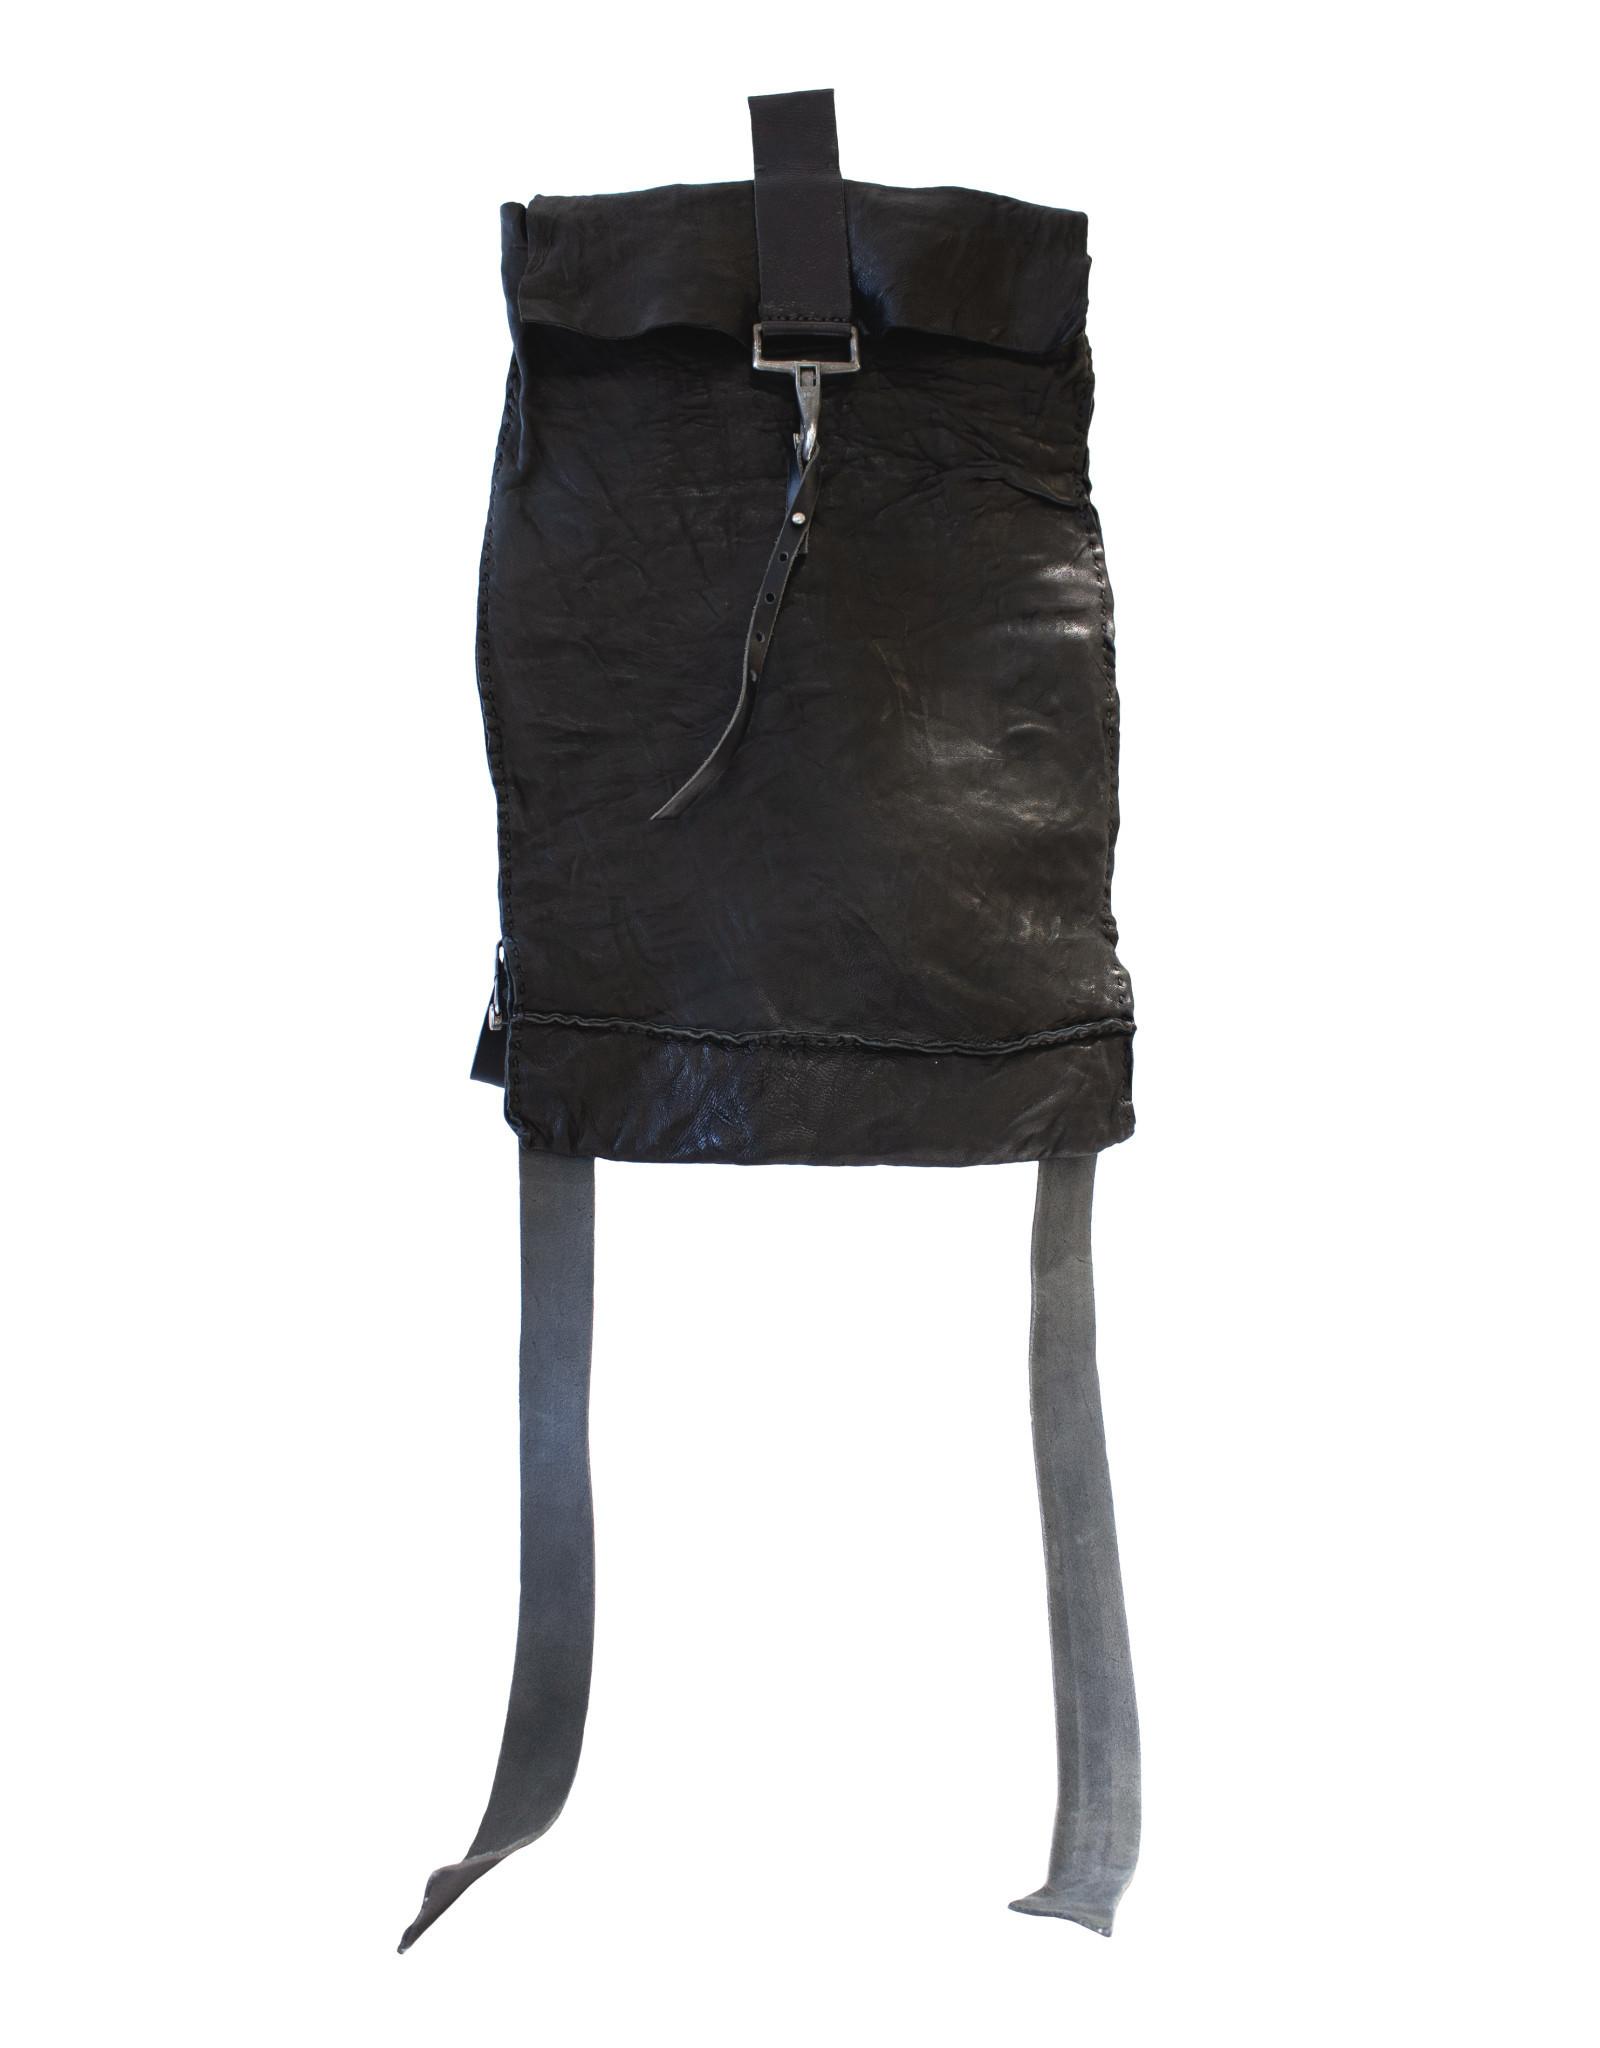 Engso Black, Folded One-Piece Back Pack - Large